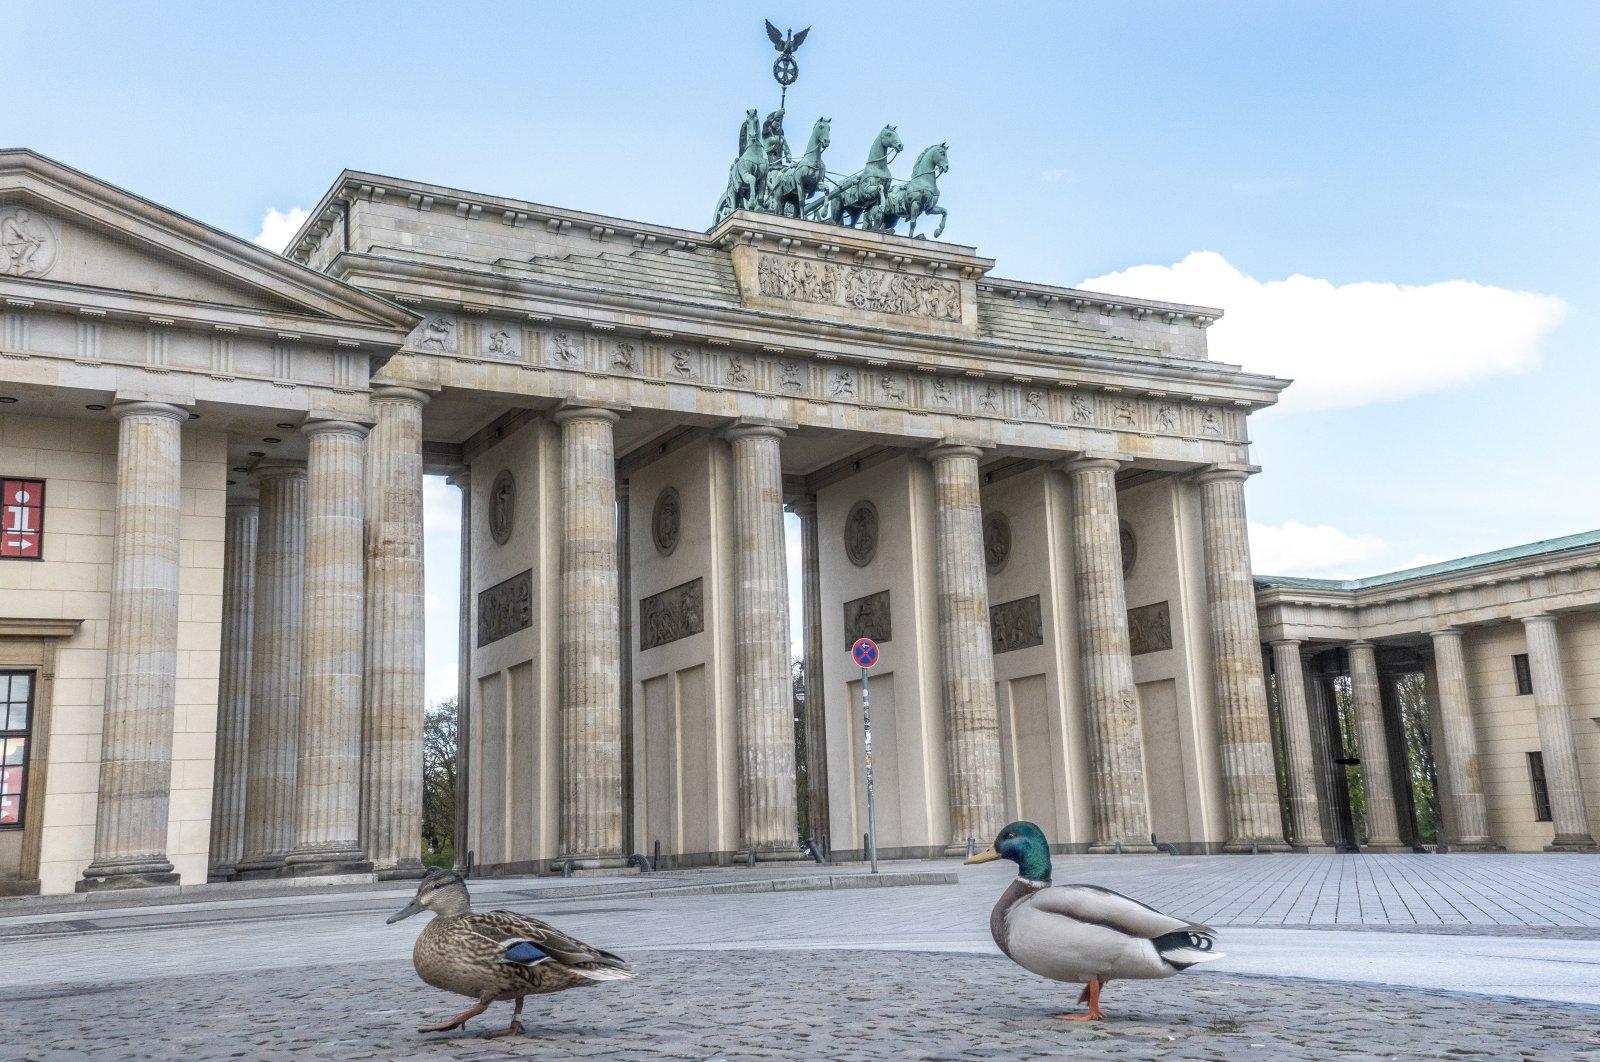 A pair of mallard ducks wanders in front of the Brandenburg Gate at Pariser Platz in Berlin, Germany, April 14, 2020. (EPA Photo)